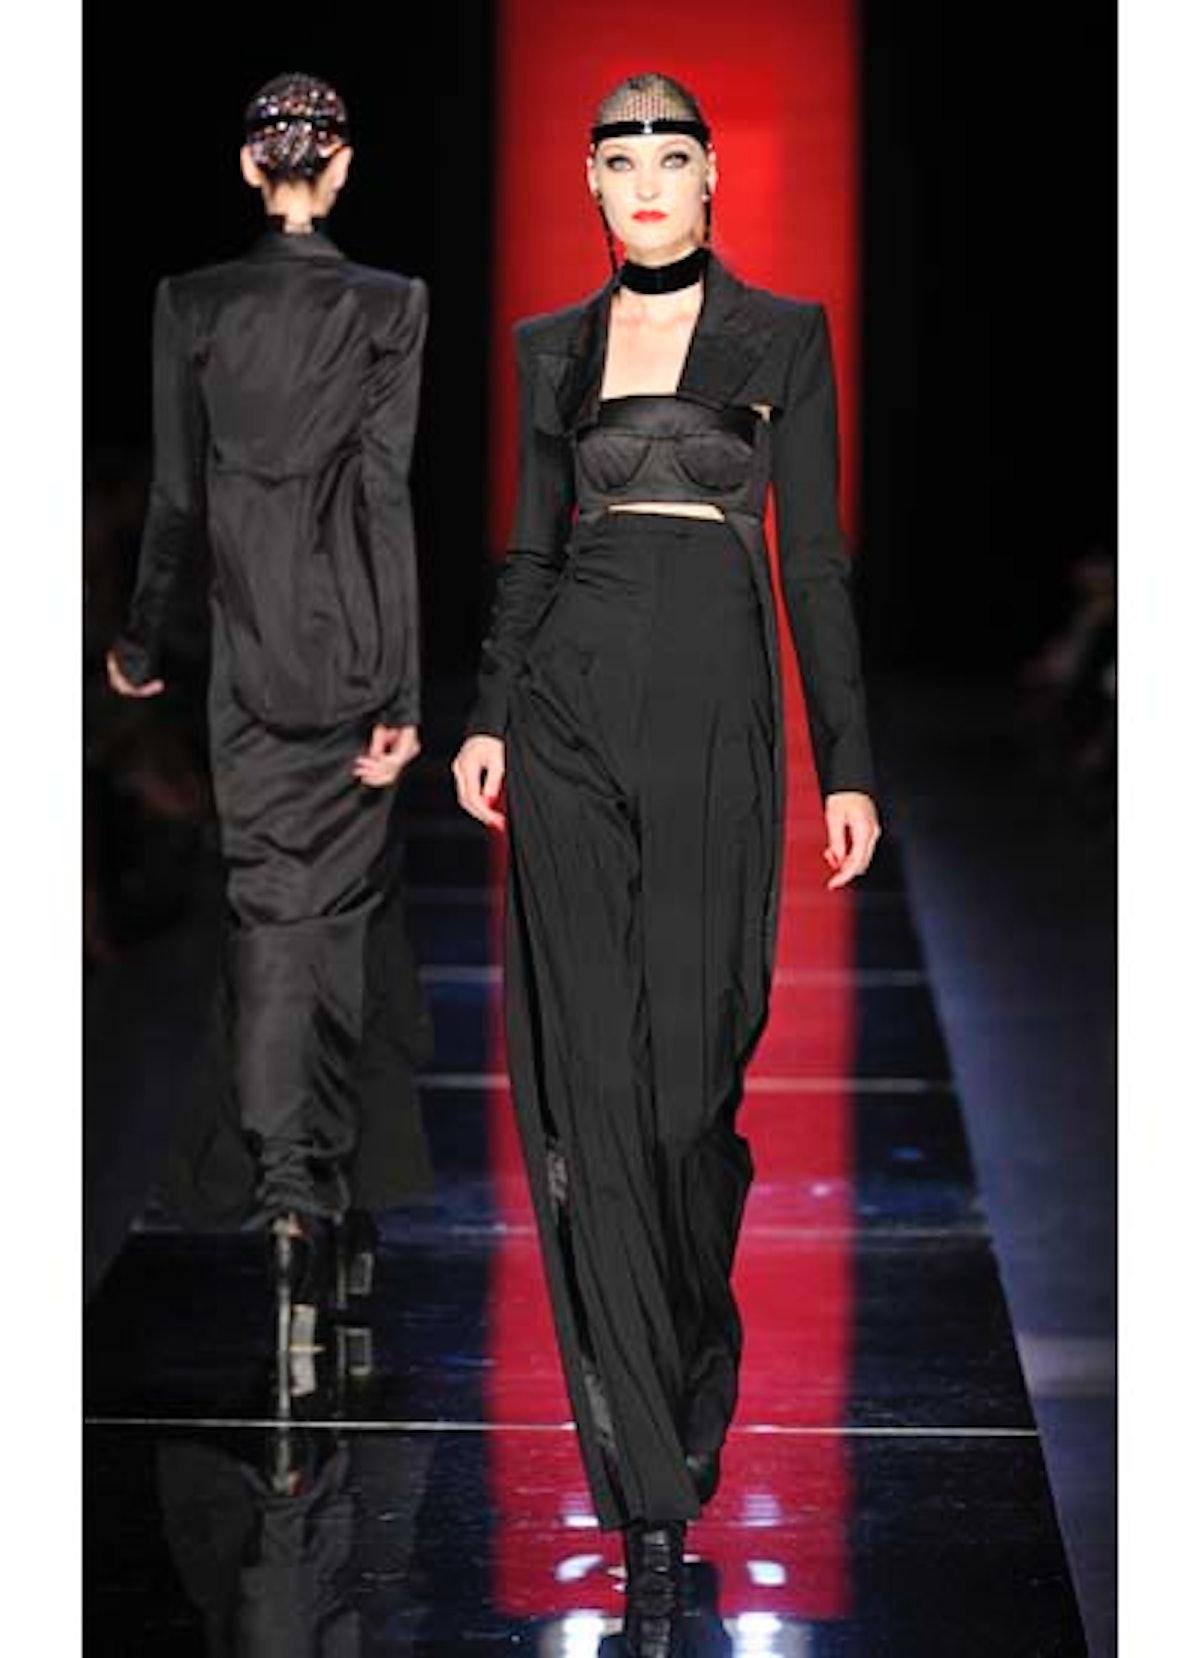 fass-jean-paul-gaultier-couture-2012-runway-08-v.jpg